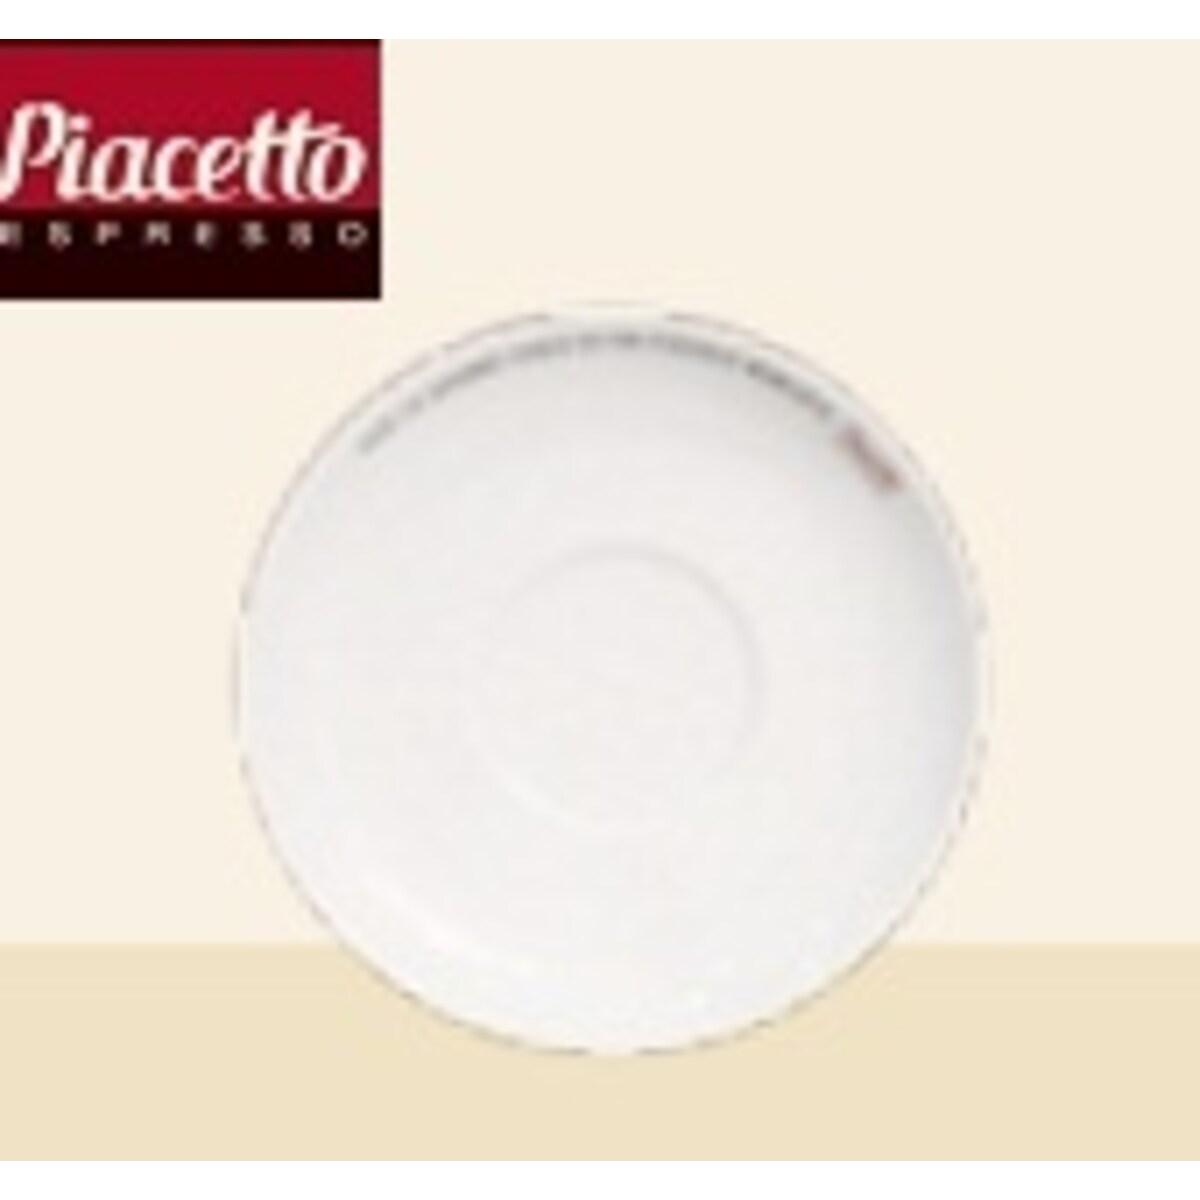 Tchibo Piacetto Espresso - чинийки за еспресо чаши 6бр